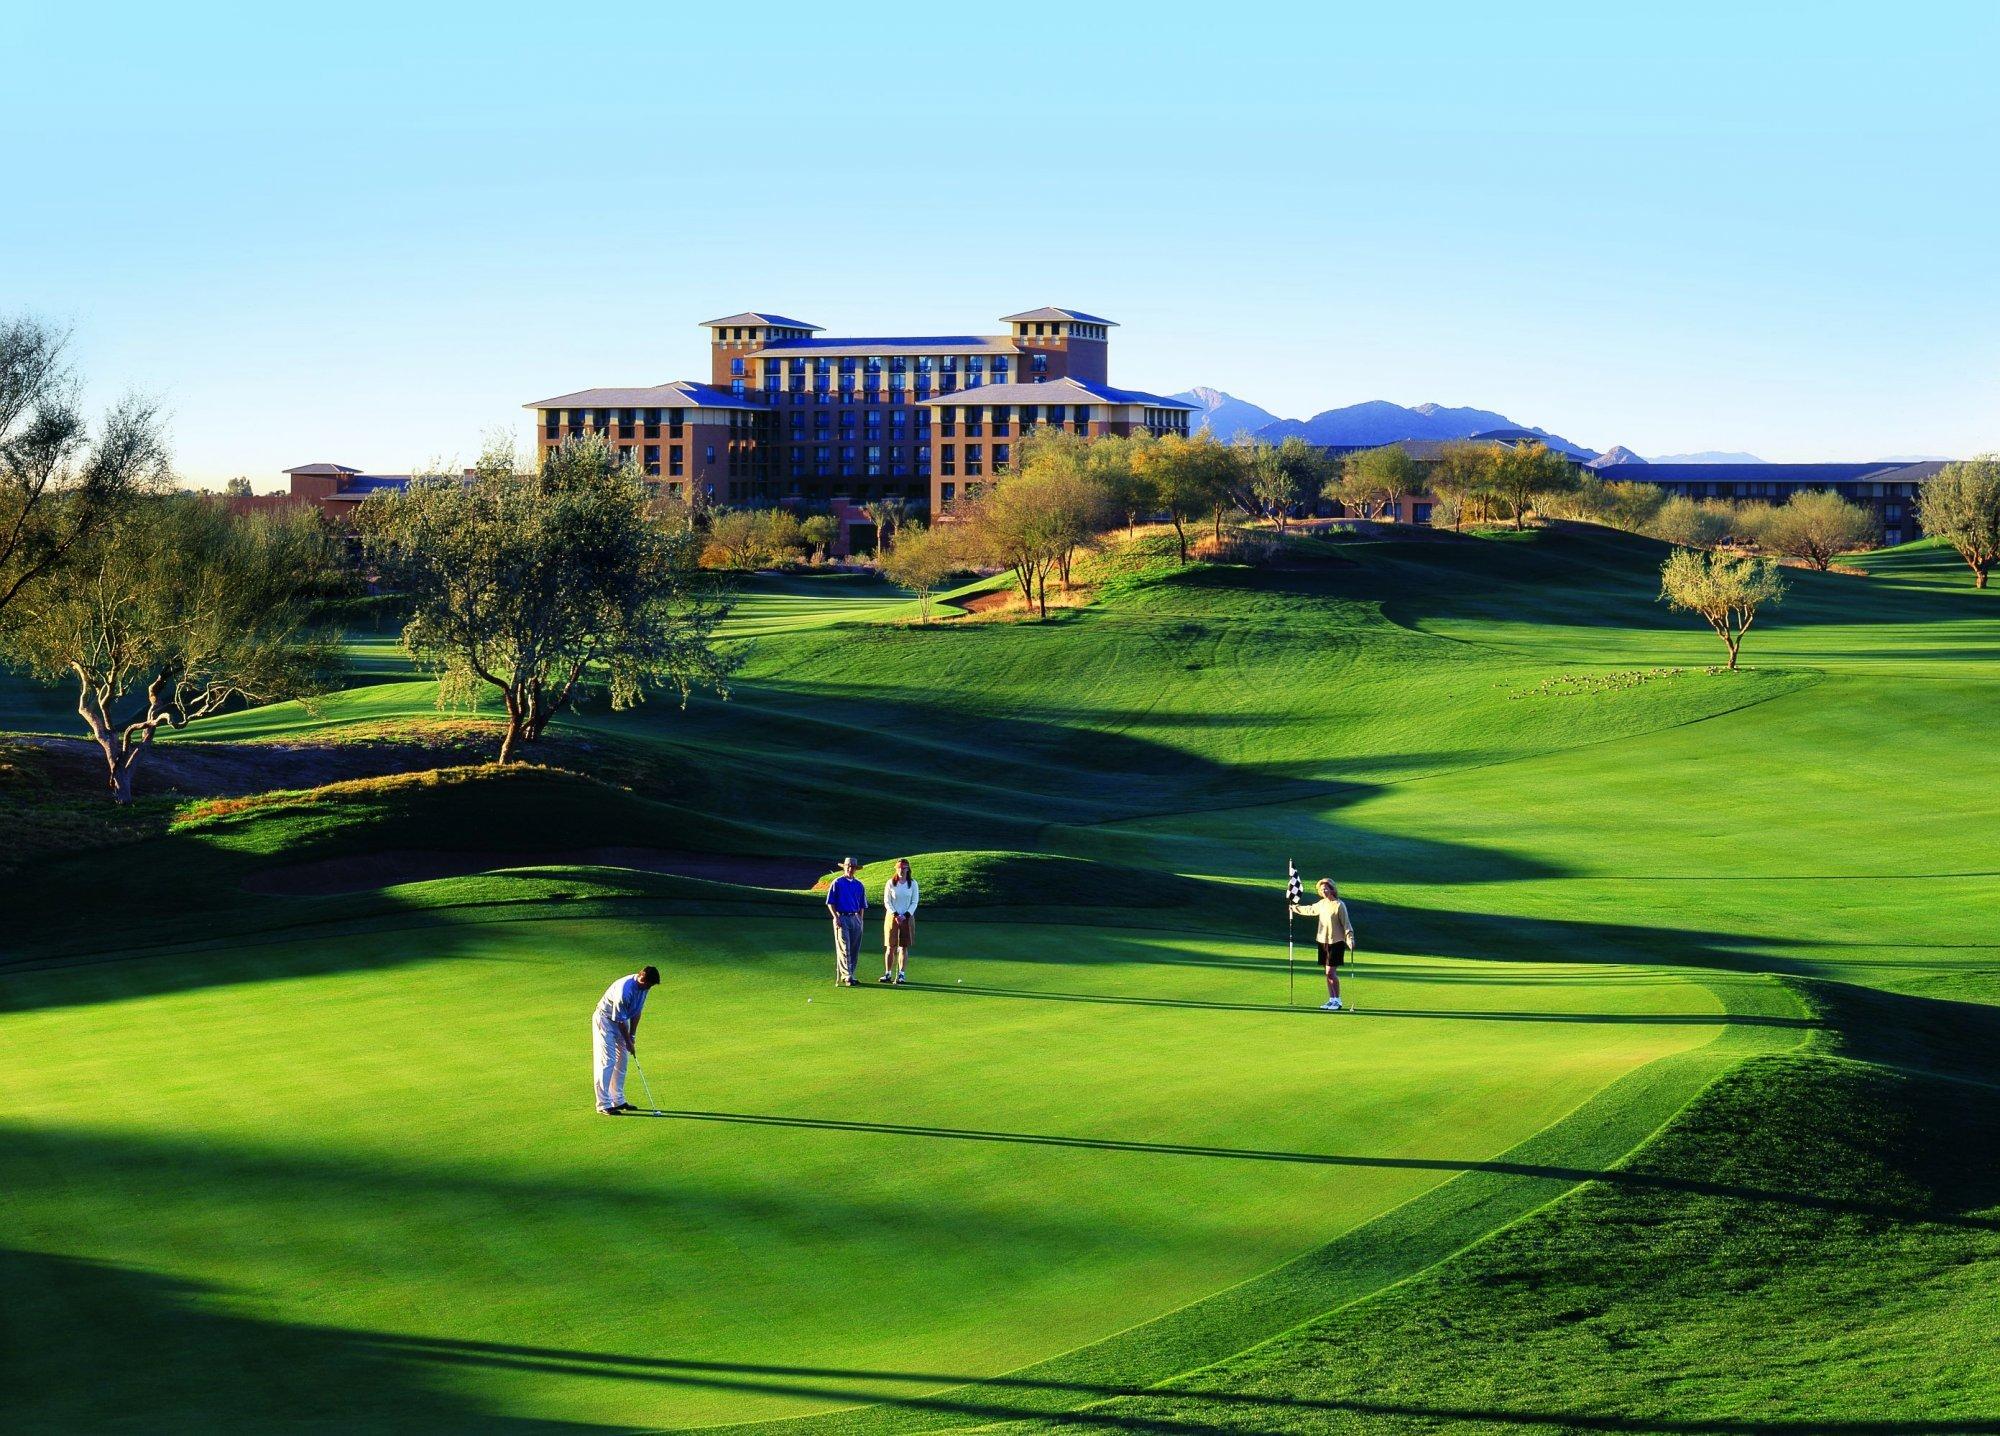 Best Golf Courses in Scottsdale Arizona